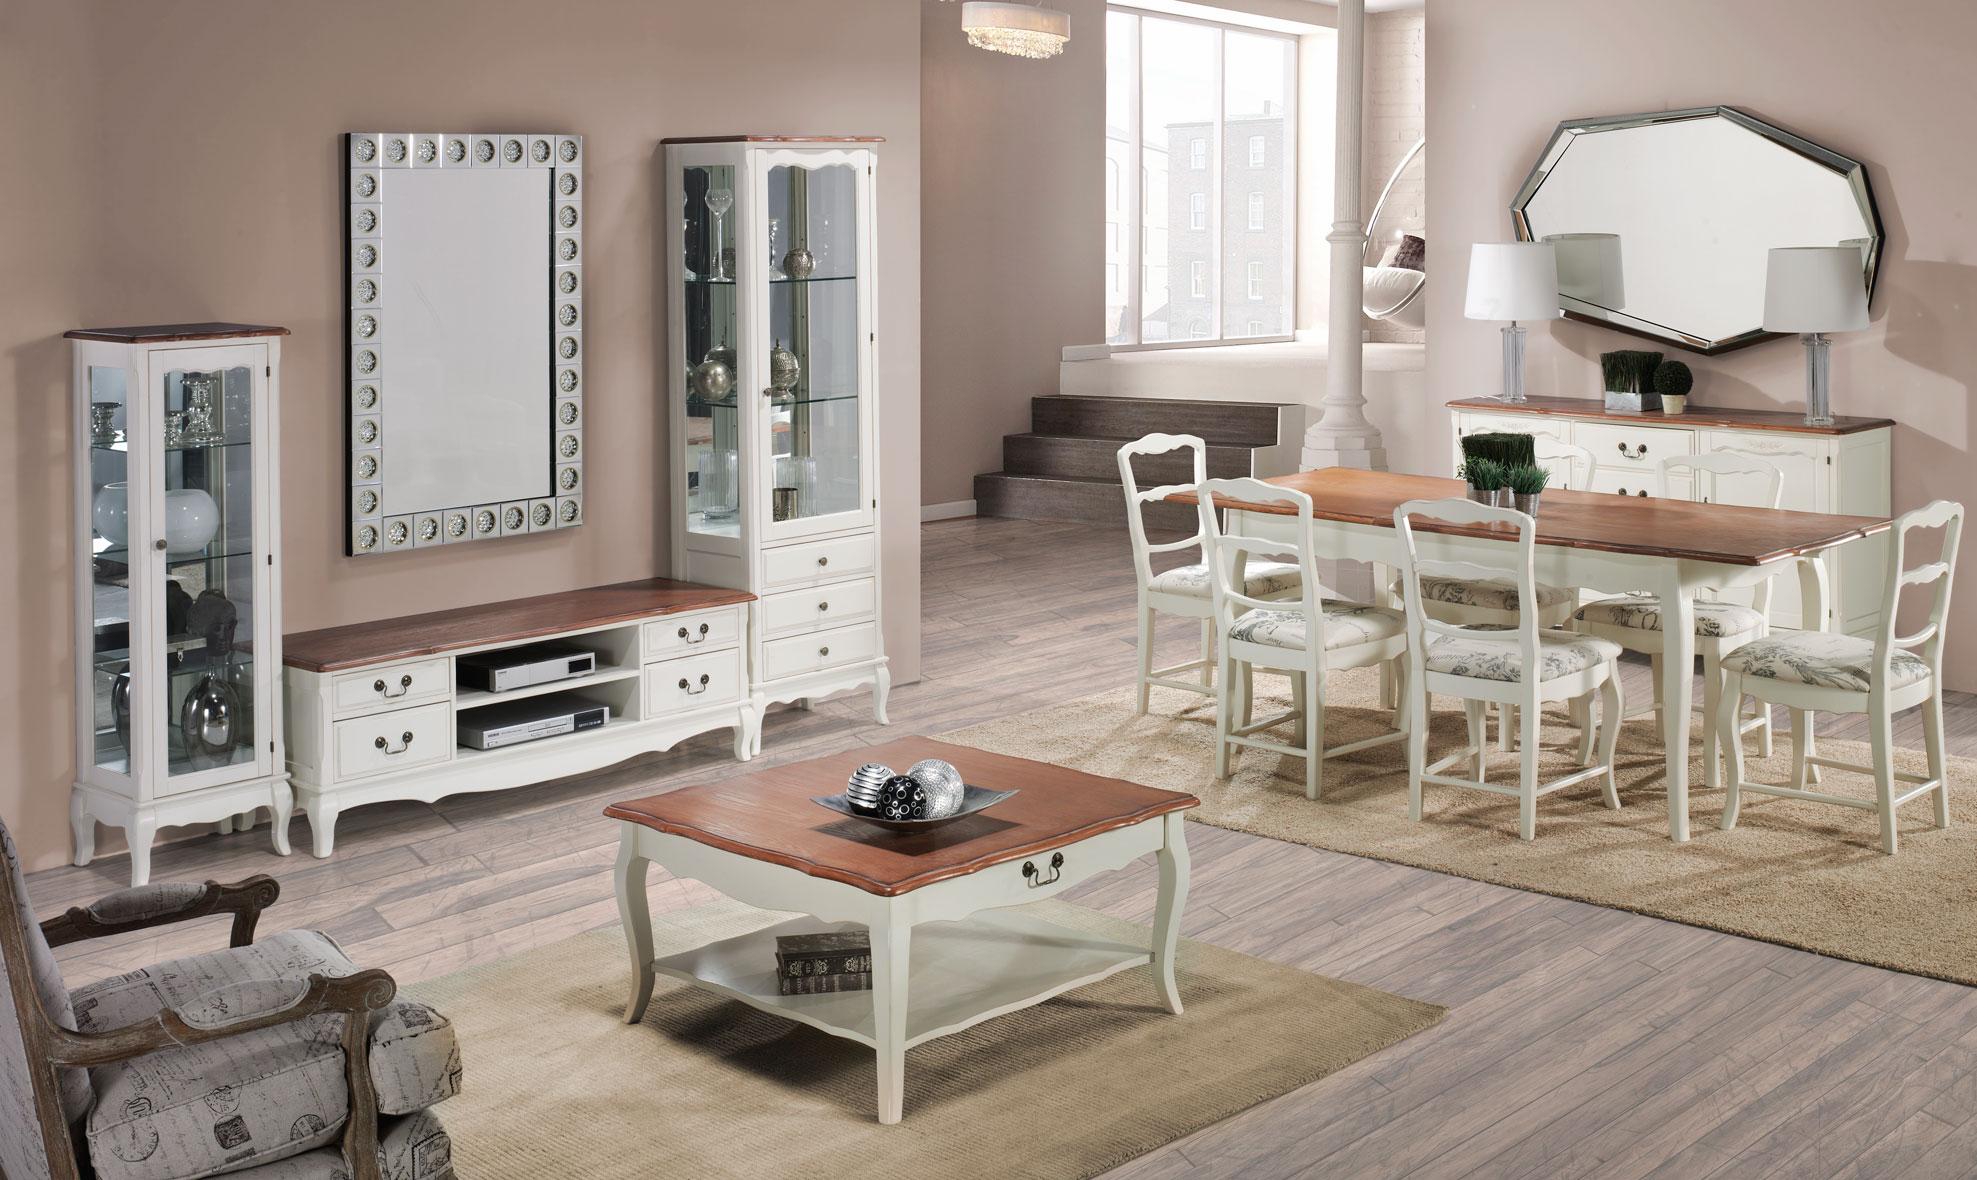 Muebles De Salon Vintage Sfgzmnt Apilable Saln Diseo Moderno Cm  # Muebles Efecto Vintage